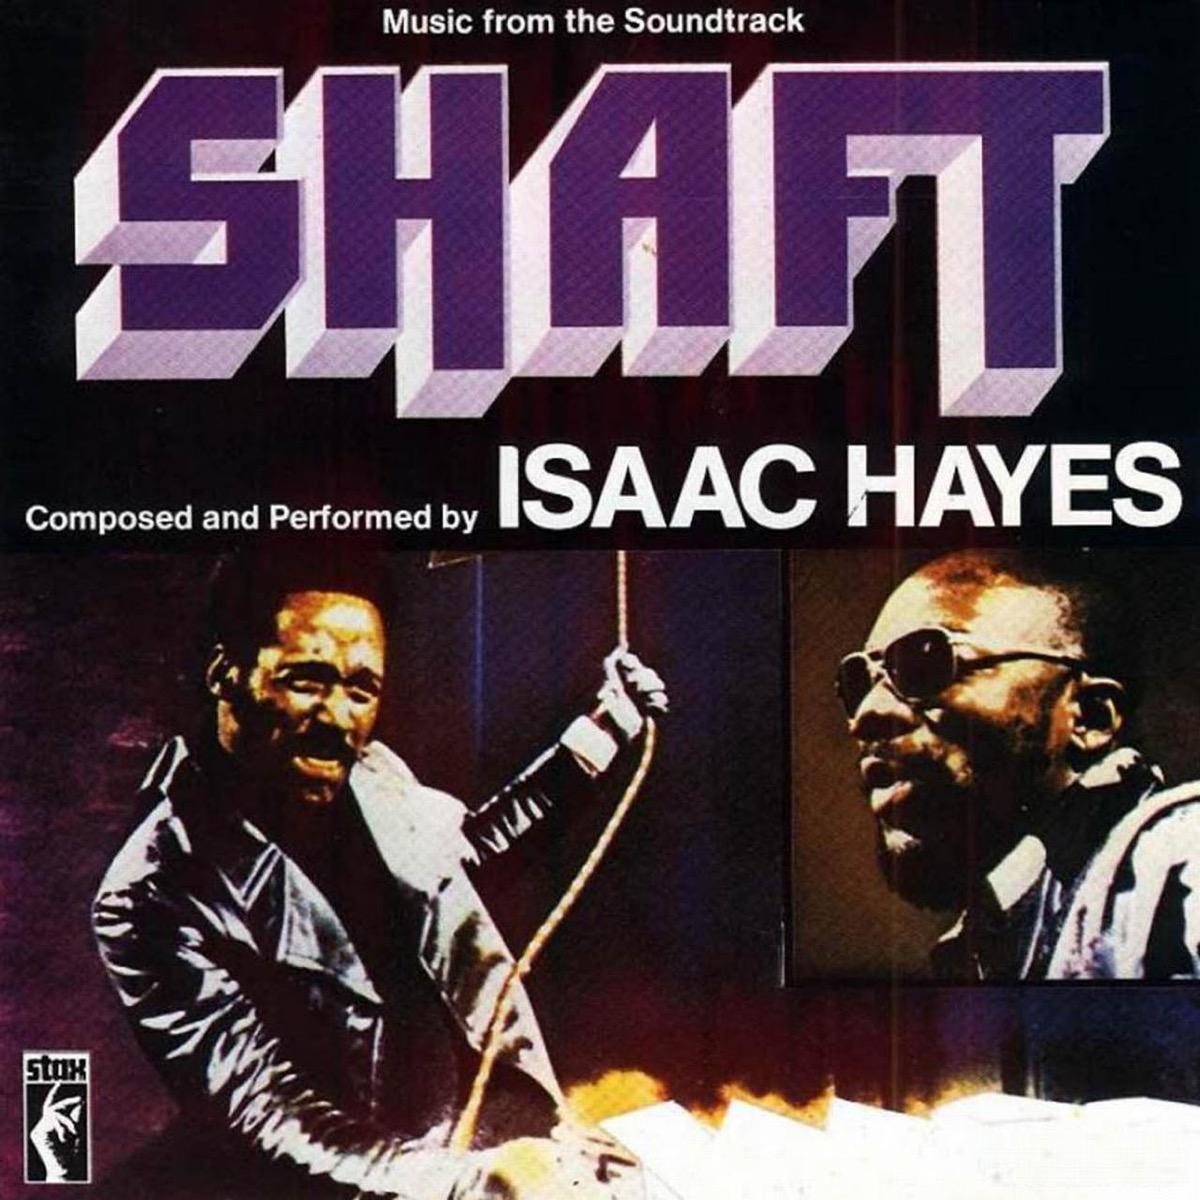 album cover of shaft soundtrack